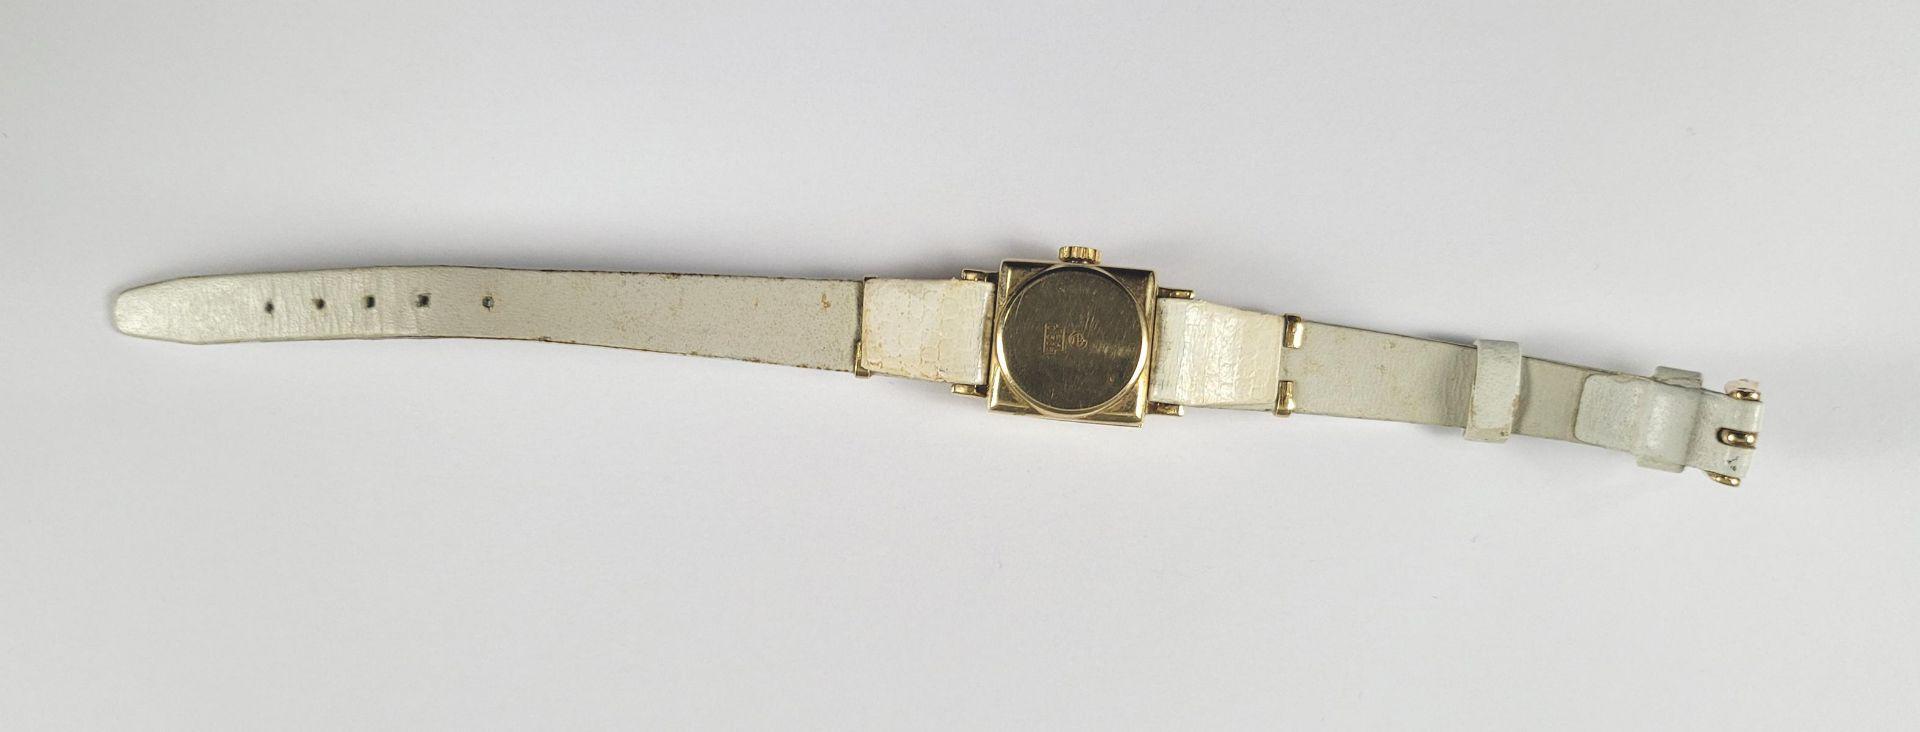 Goldene Roxy Damenarmbanduhr, 14 Karat Gelbgold - Bild 3 aus 4